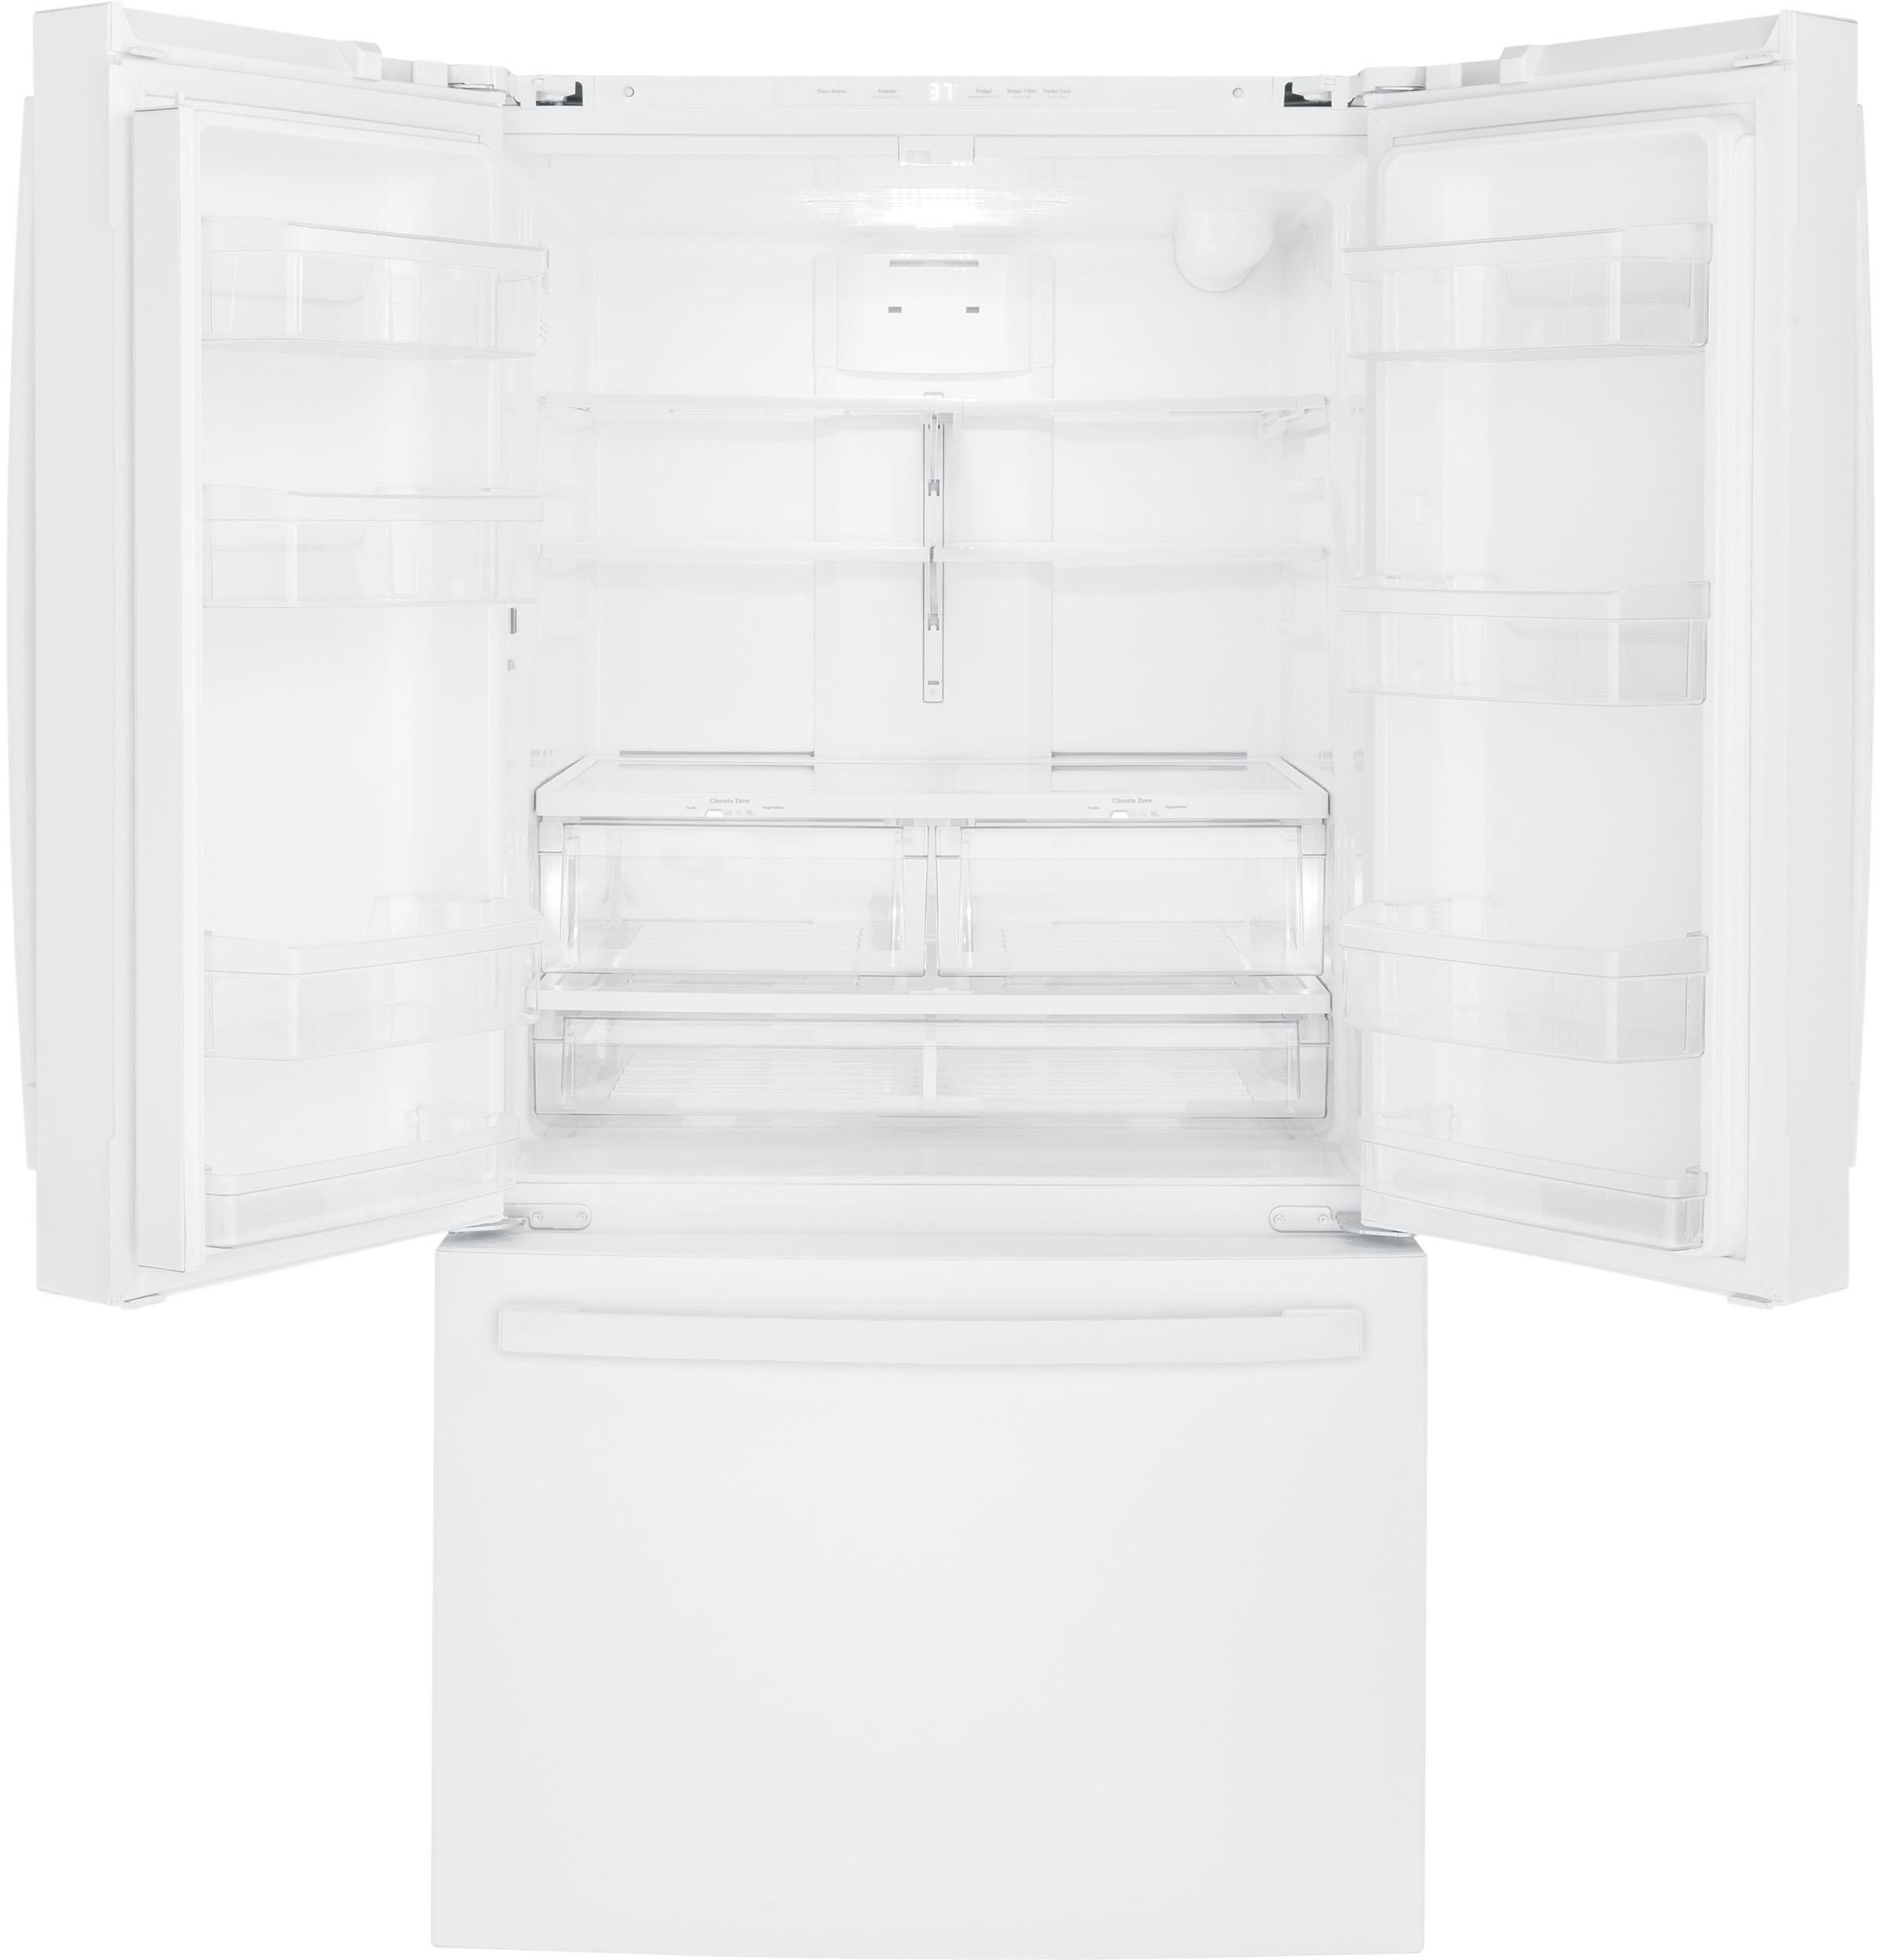 Model: GNE27JGMWW | GE GE® ENERGY STAR® 27.0 Cu. Ft. French-Door Refrigerator